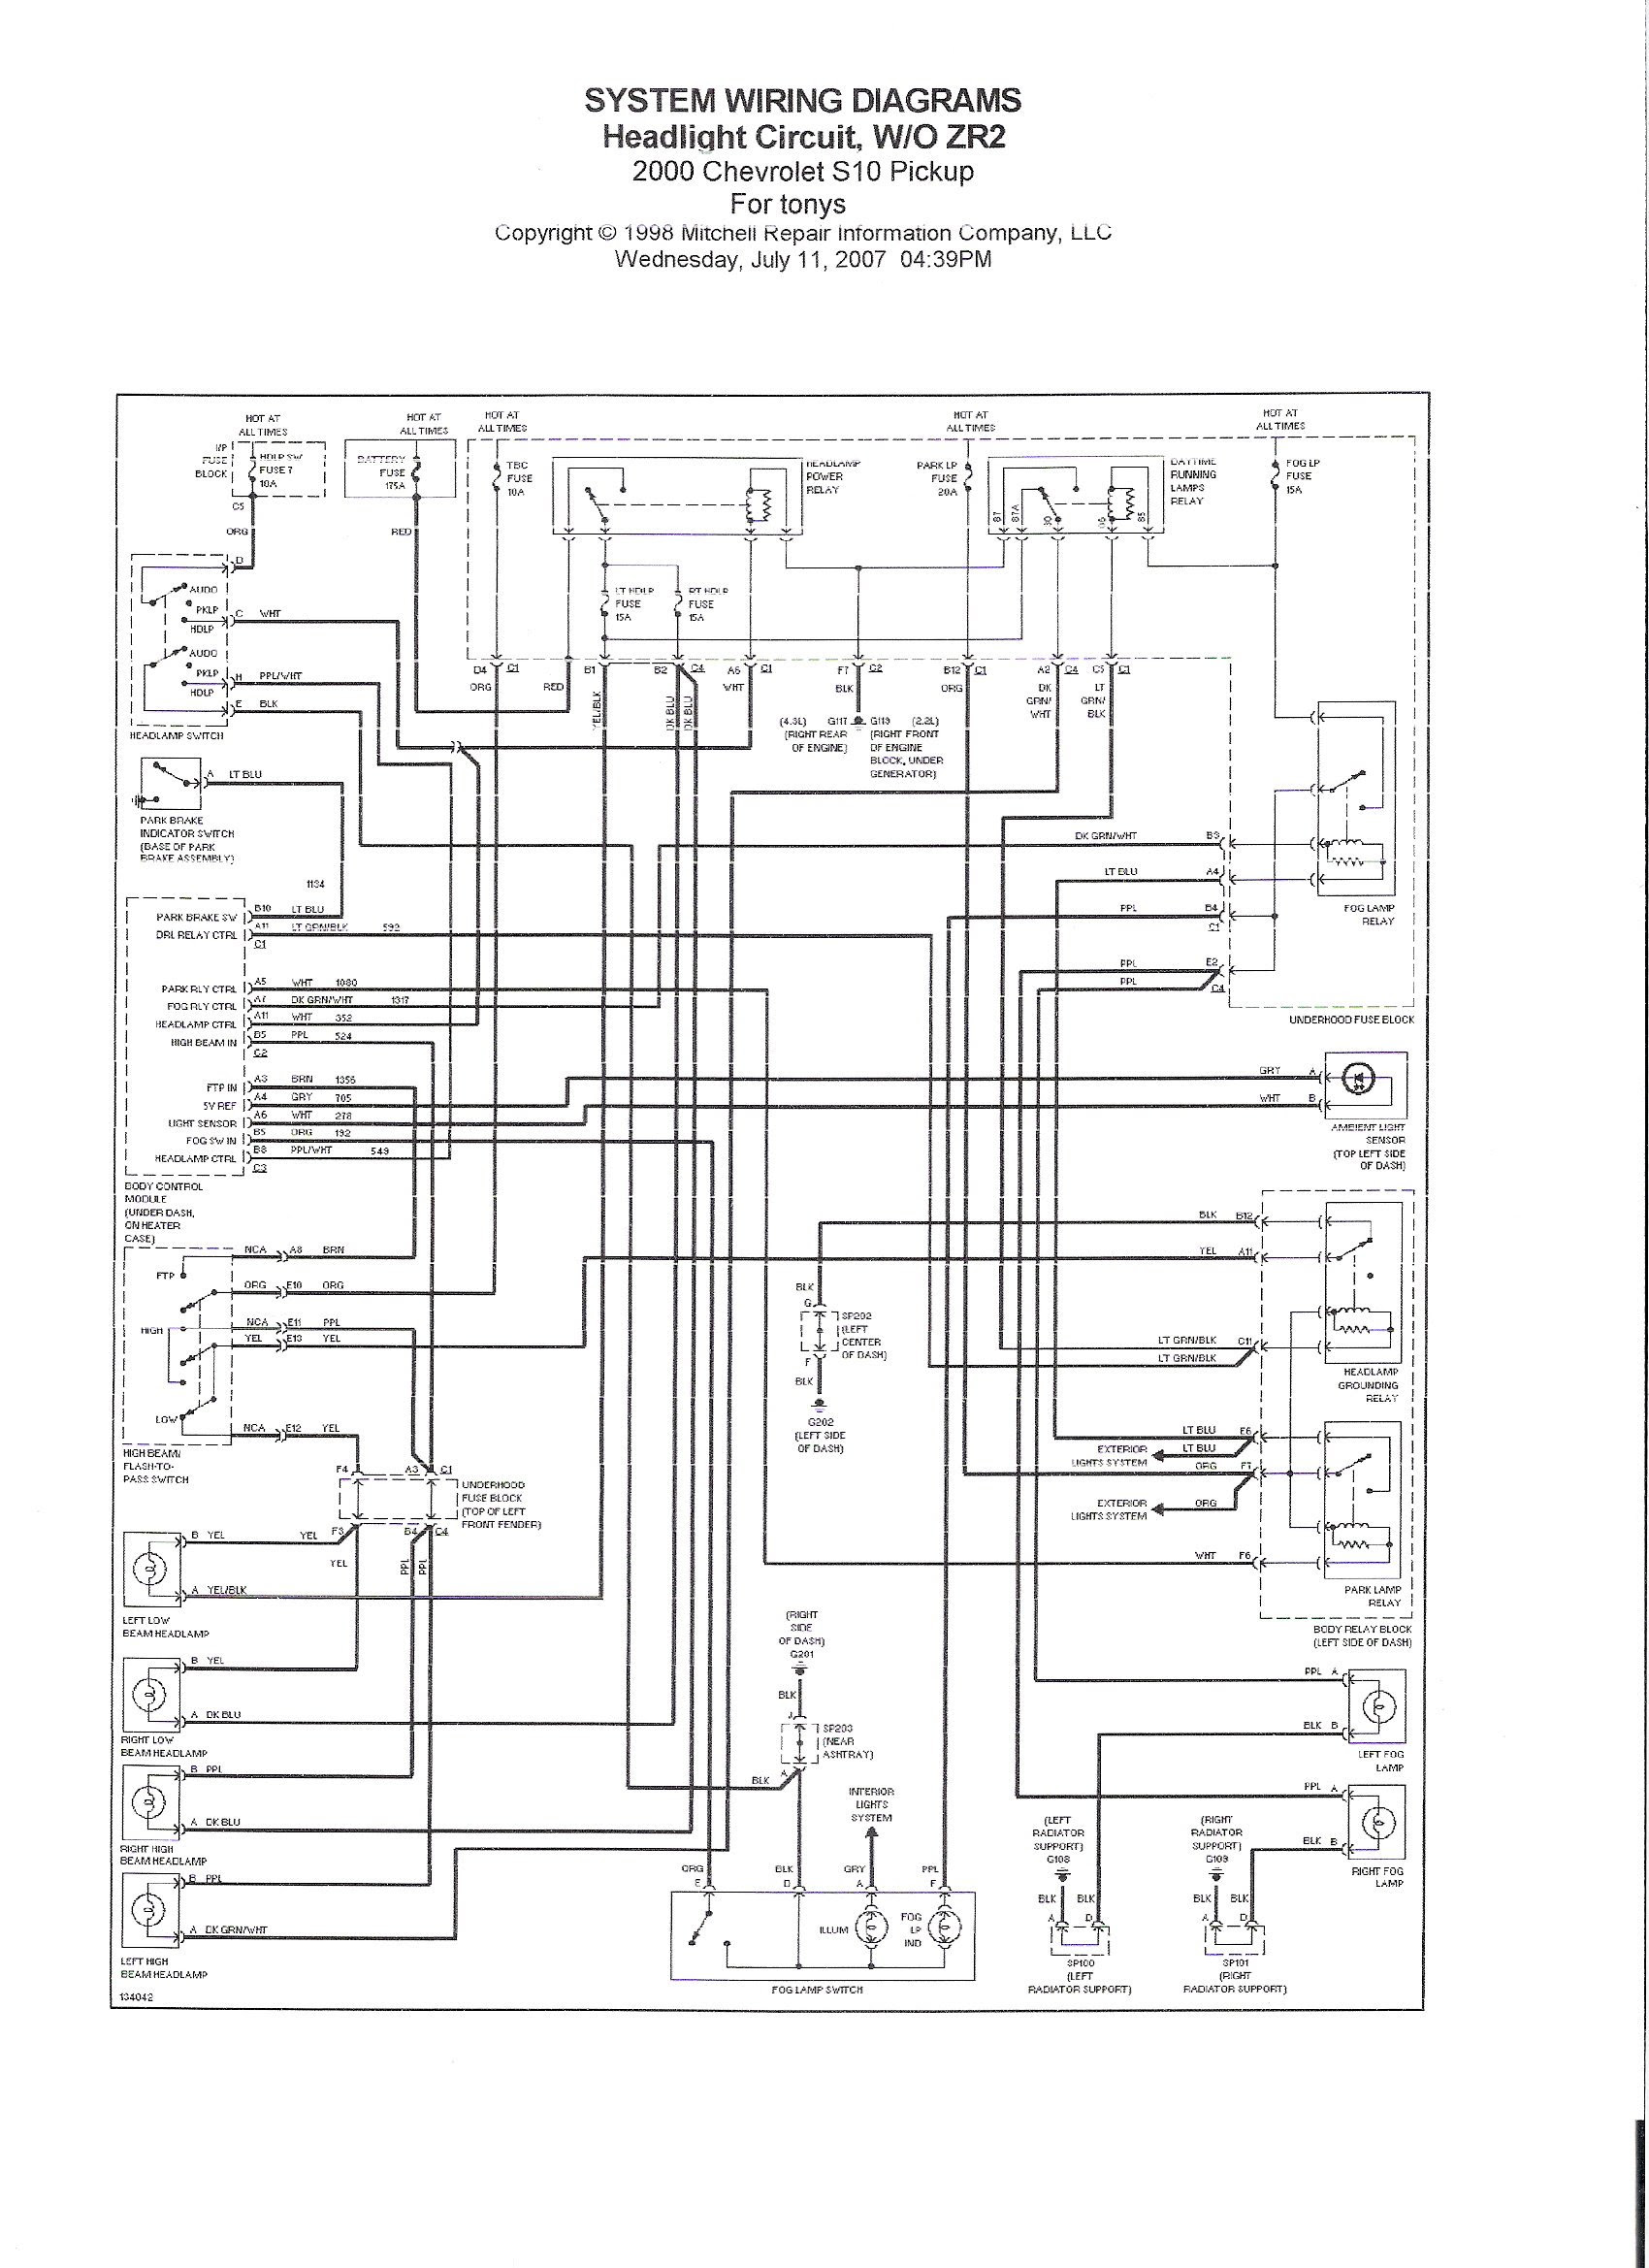 Bulldog Remote Starter Wiring Diagram 98 S10